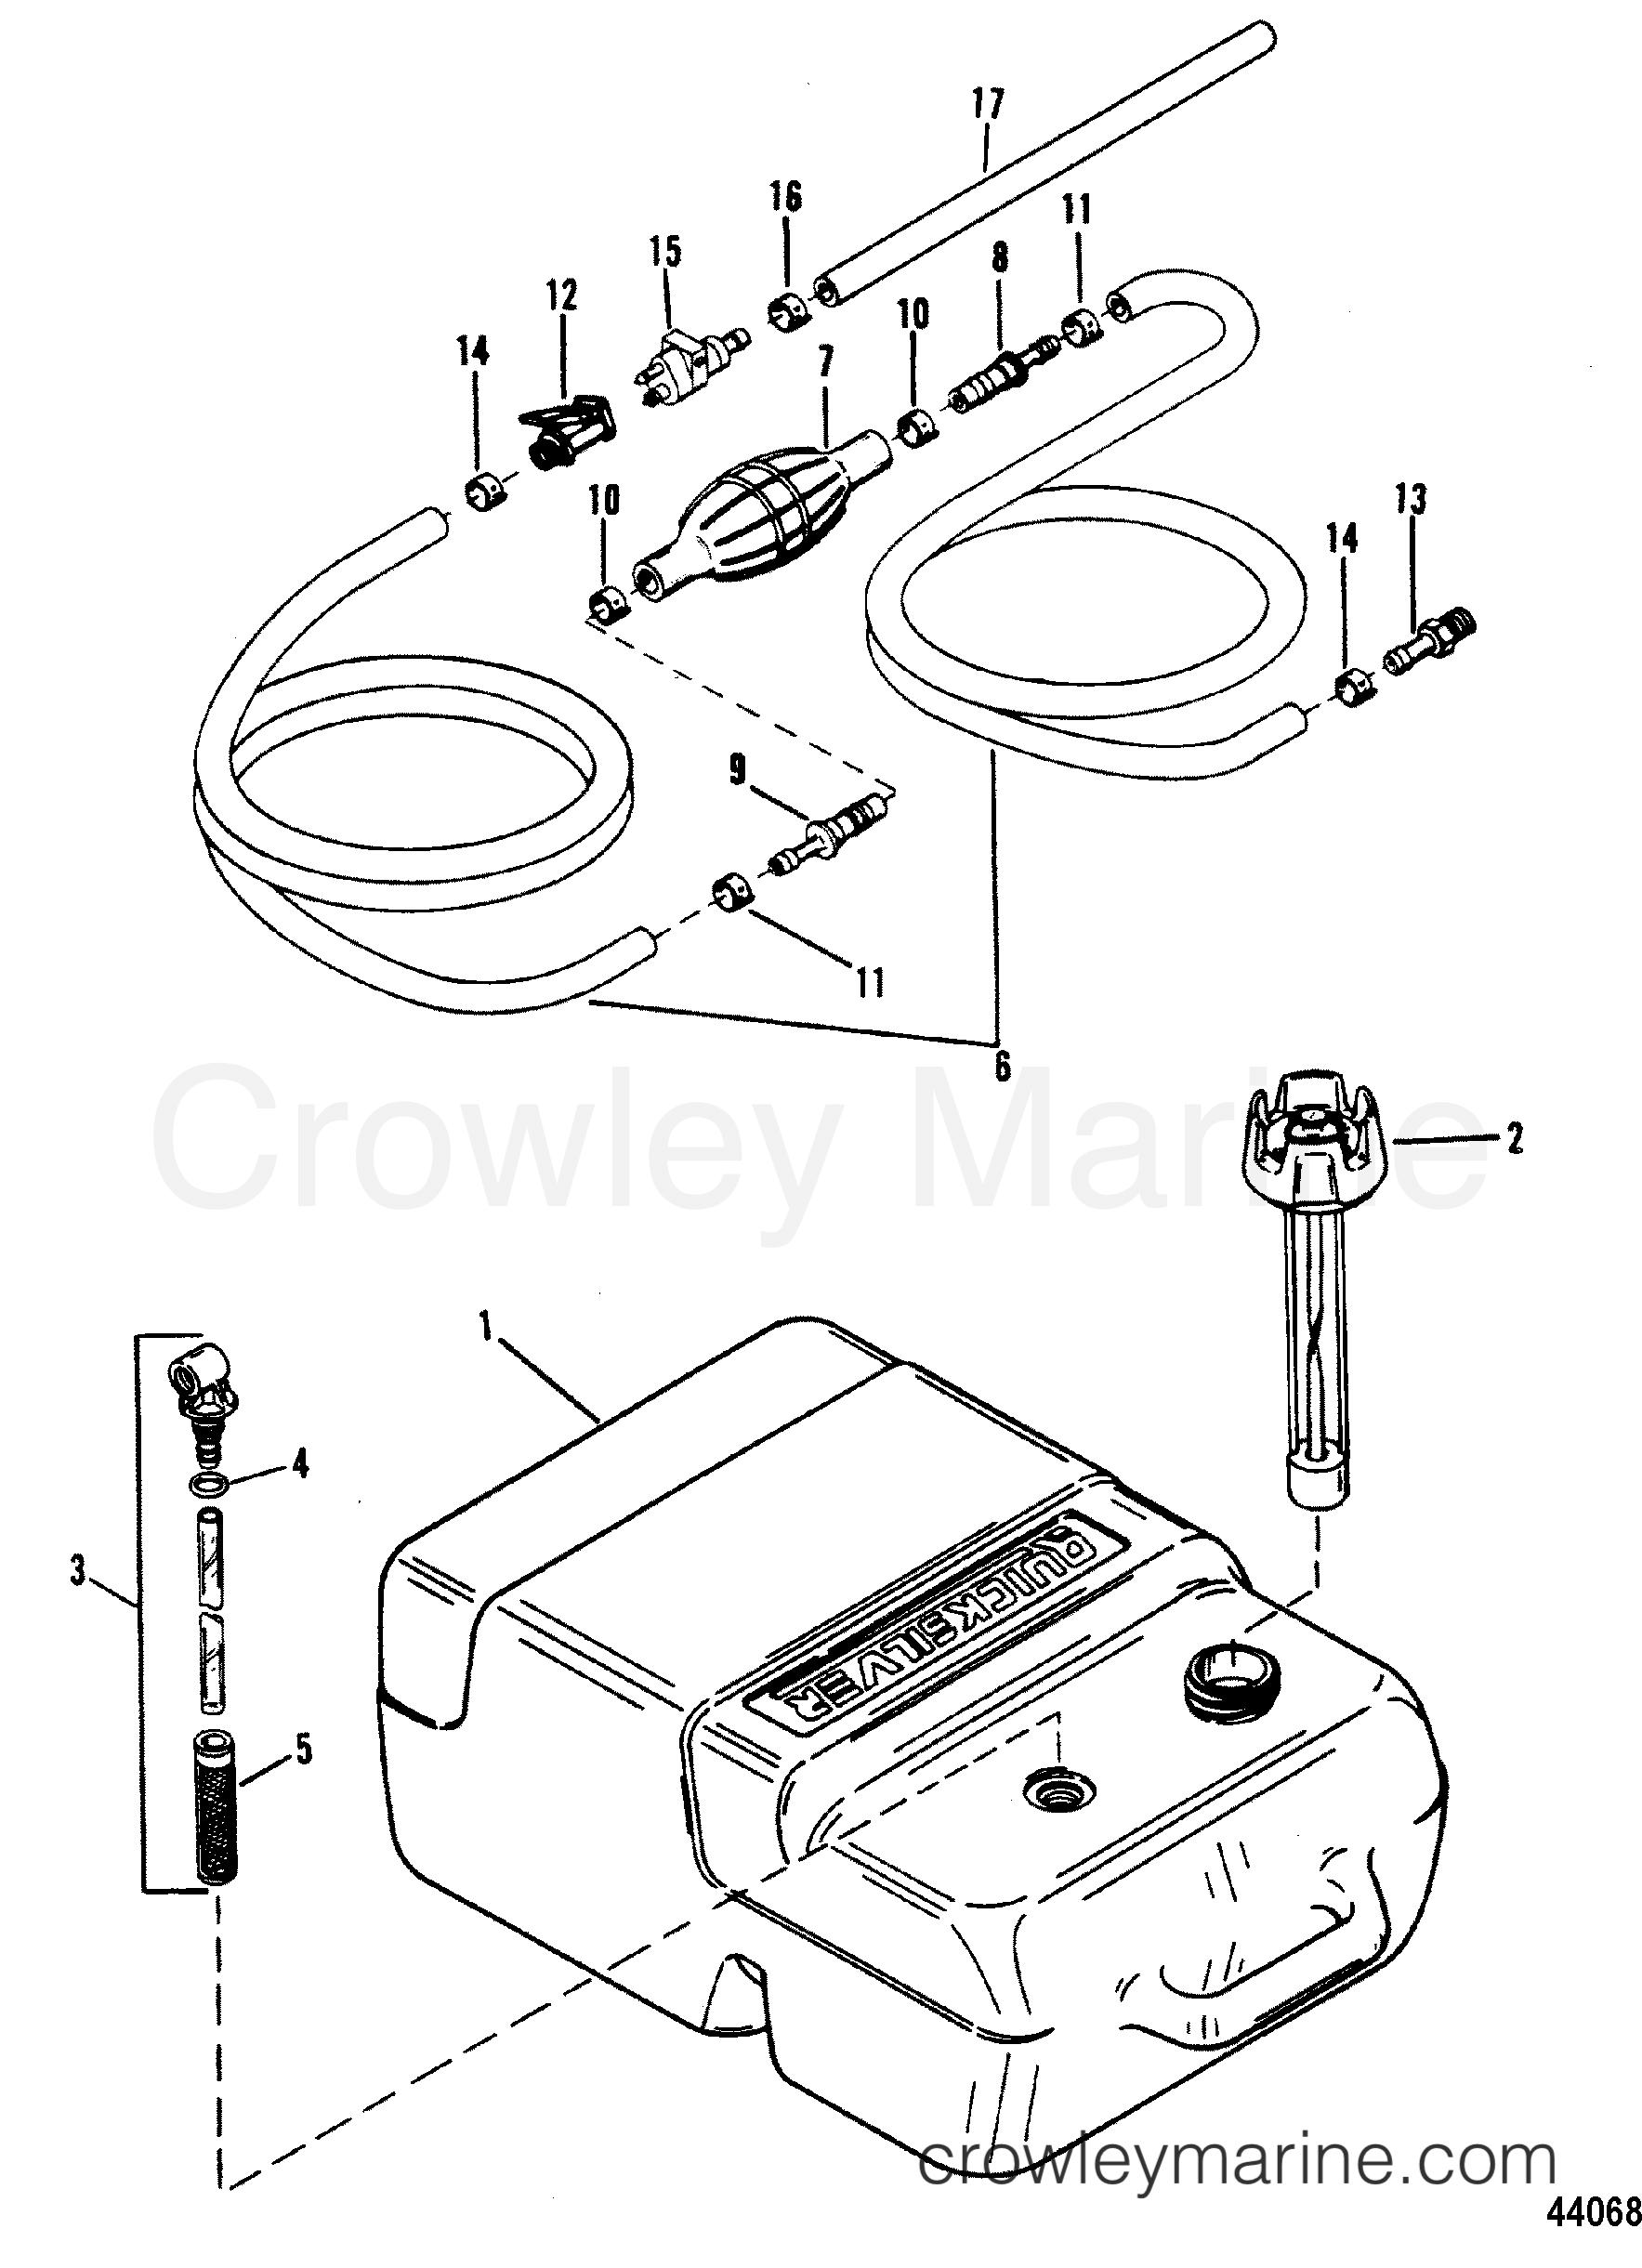 fuel tank and line plastic - 6 6 gallon